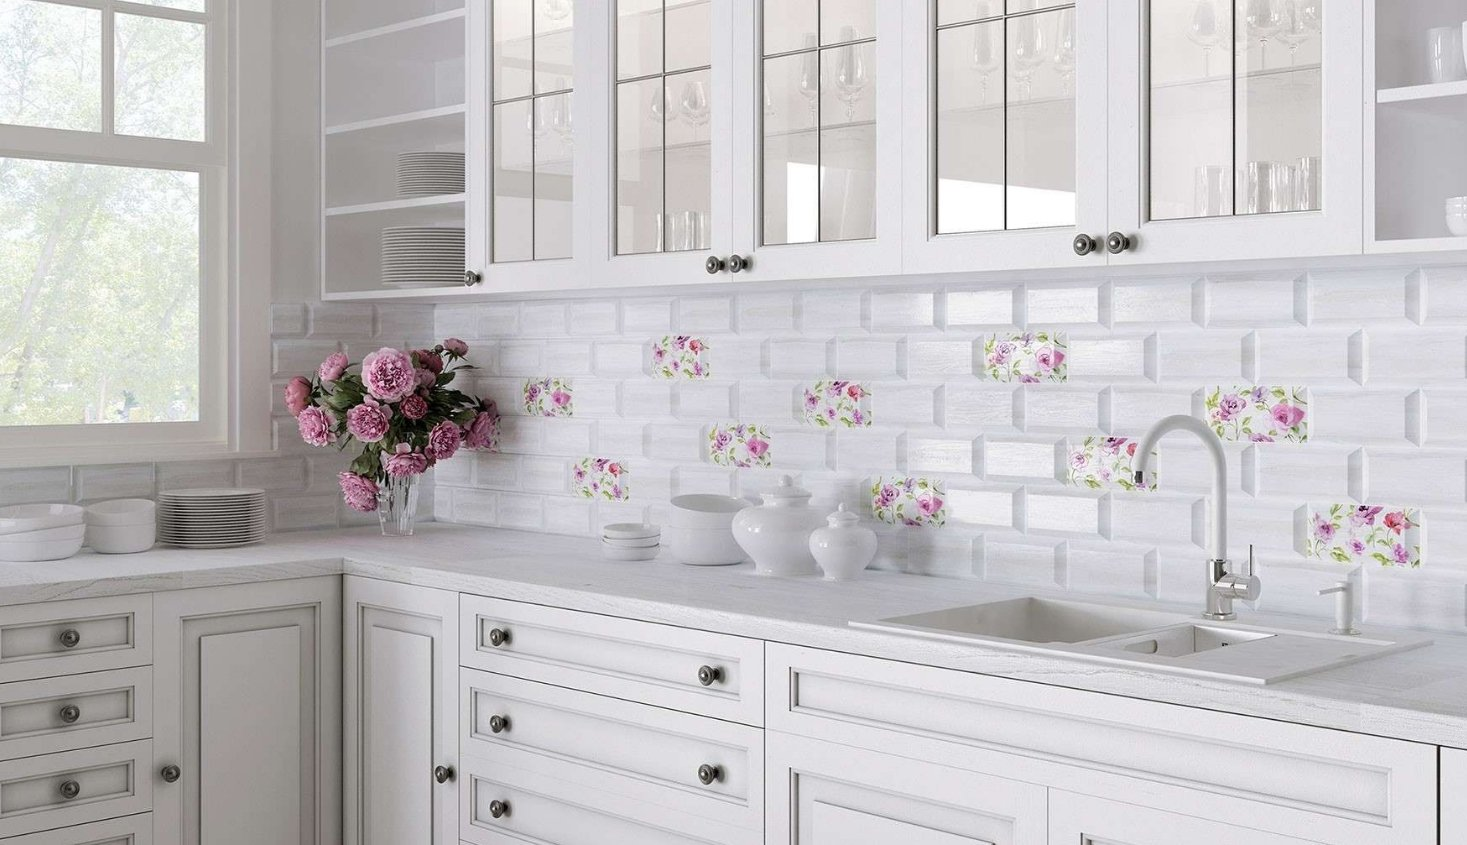 Kitchen Splashback Tile: Best Design and Decoration Ideas. Neat interior with eco floral motiffs